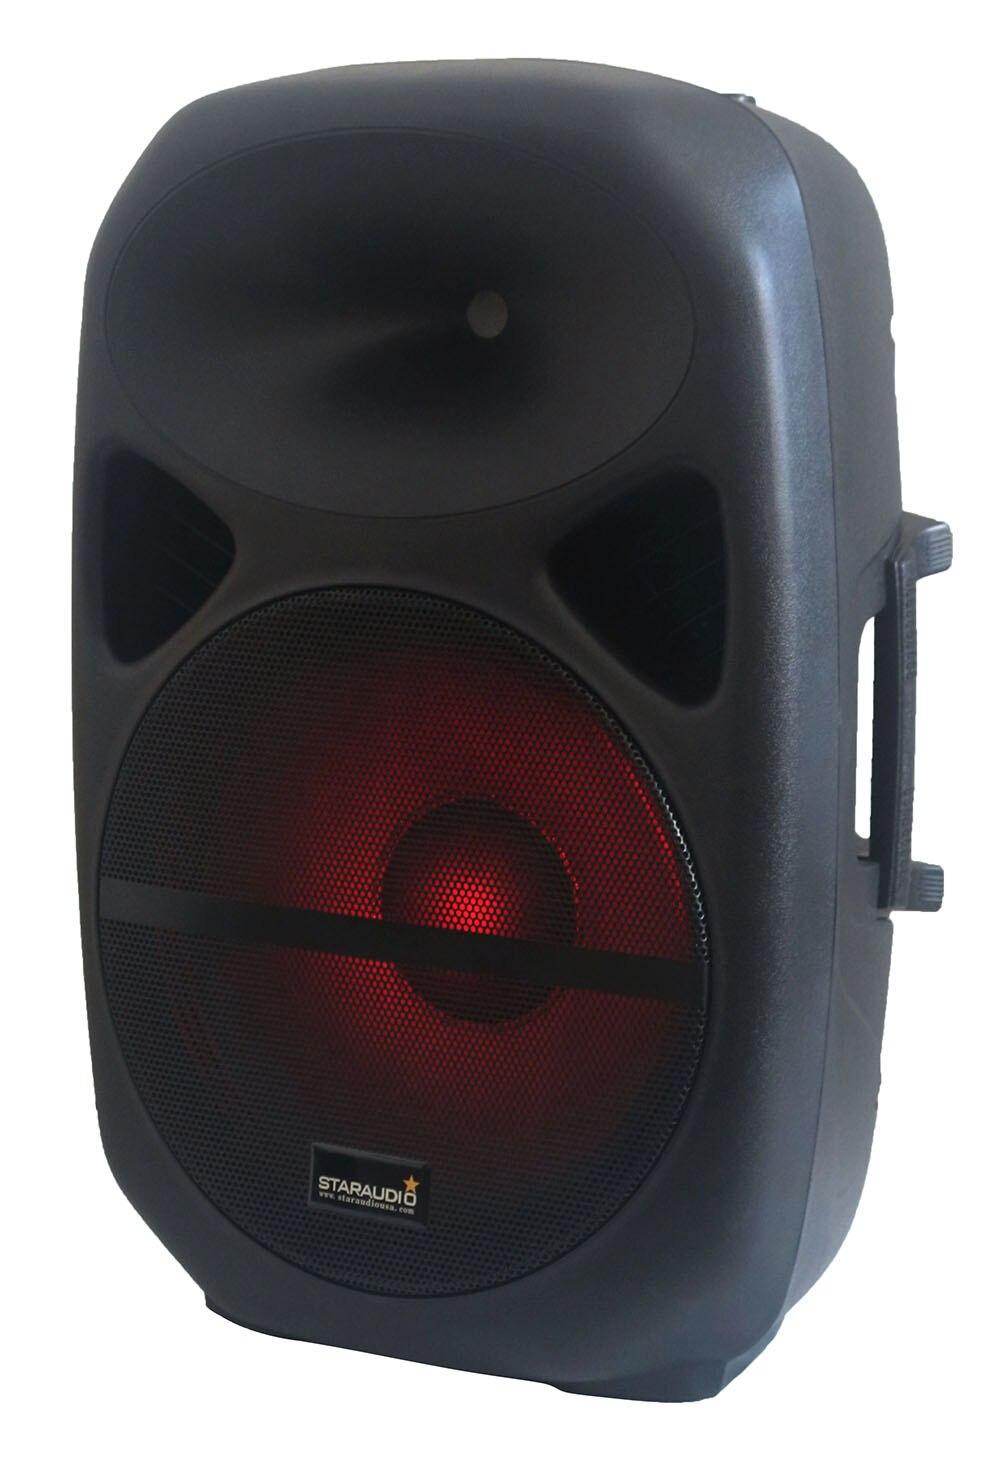 staraudio 15 2500w pro pa dj powered speaker with led lighting rgb bluetooth sd card usb mp3 player for karaoke ktv party disco